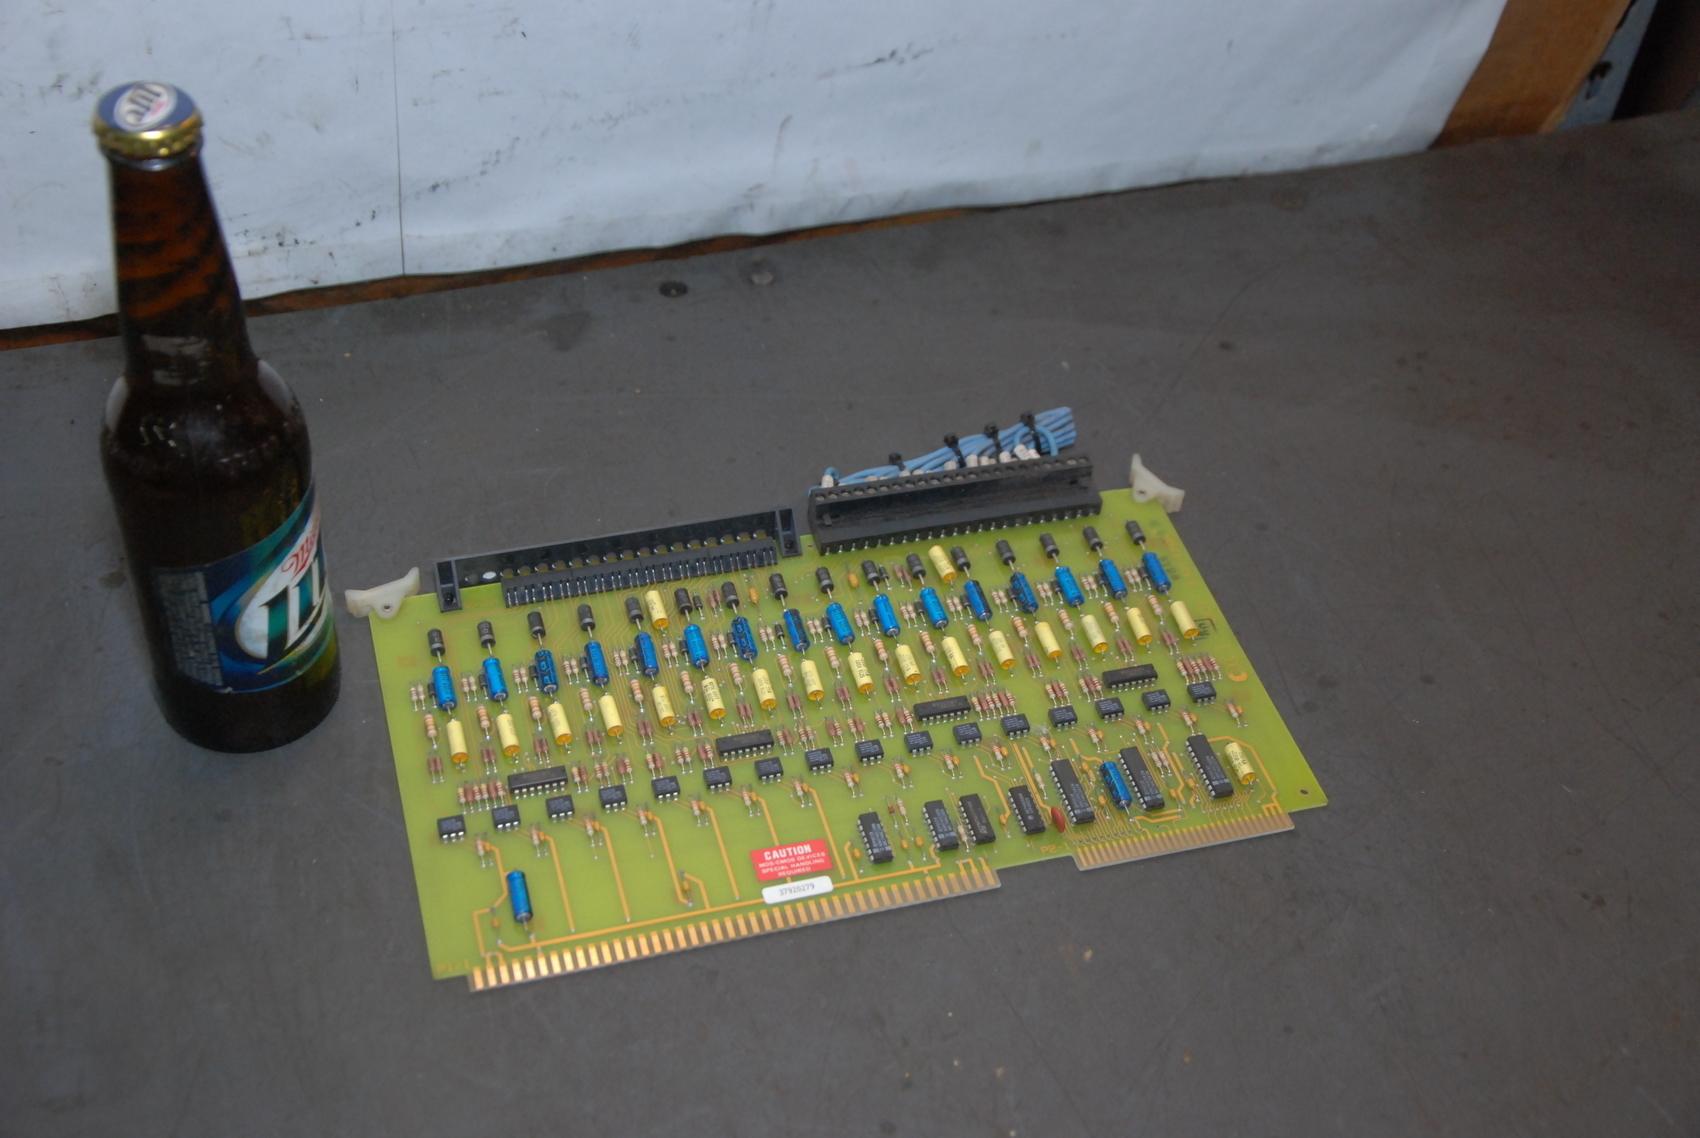 Cincinnati injection molder board HDCI 3-531-4350A,39920297